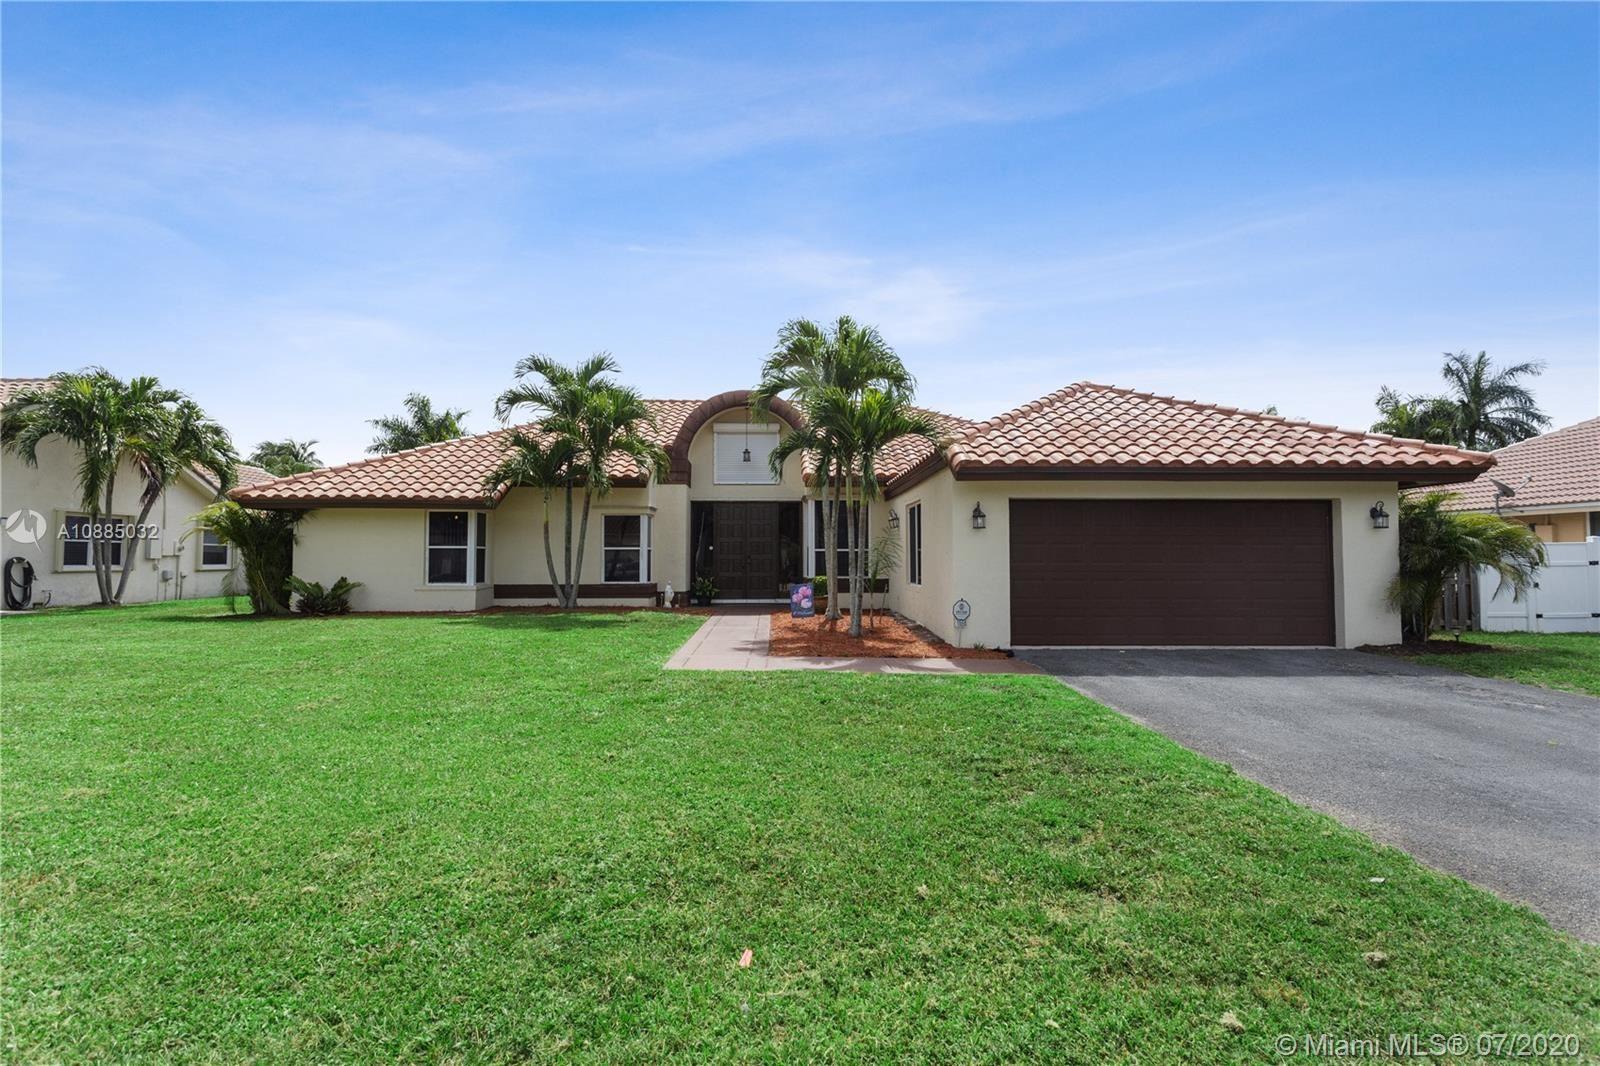 1550 SW 52nd Way, Plantation, FL 33317 - #: A10885032